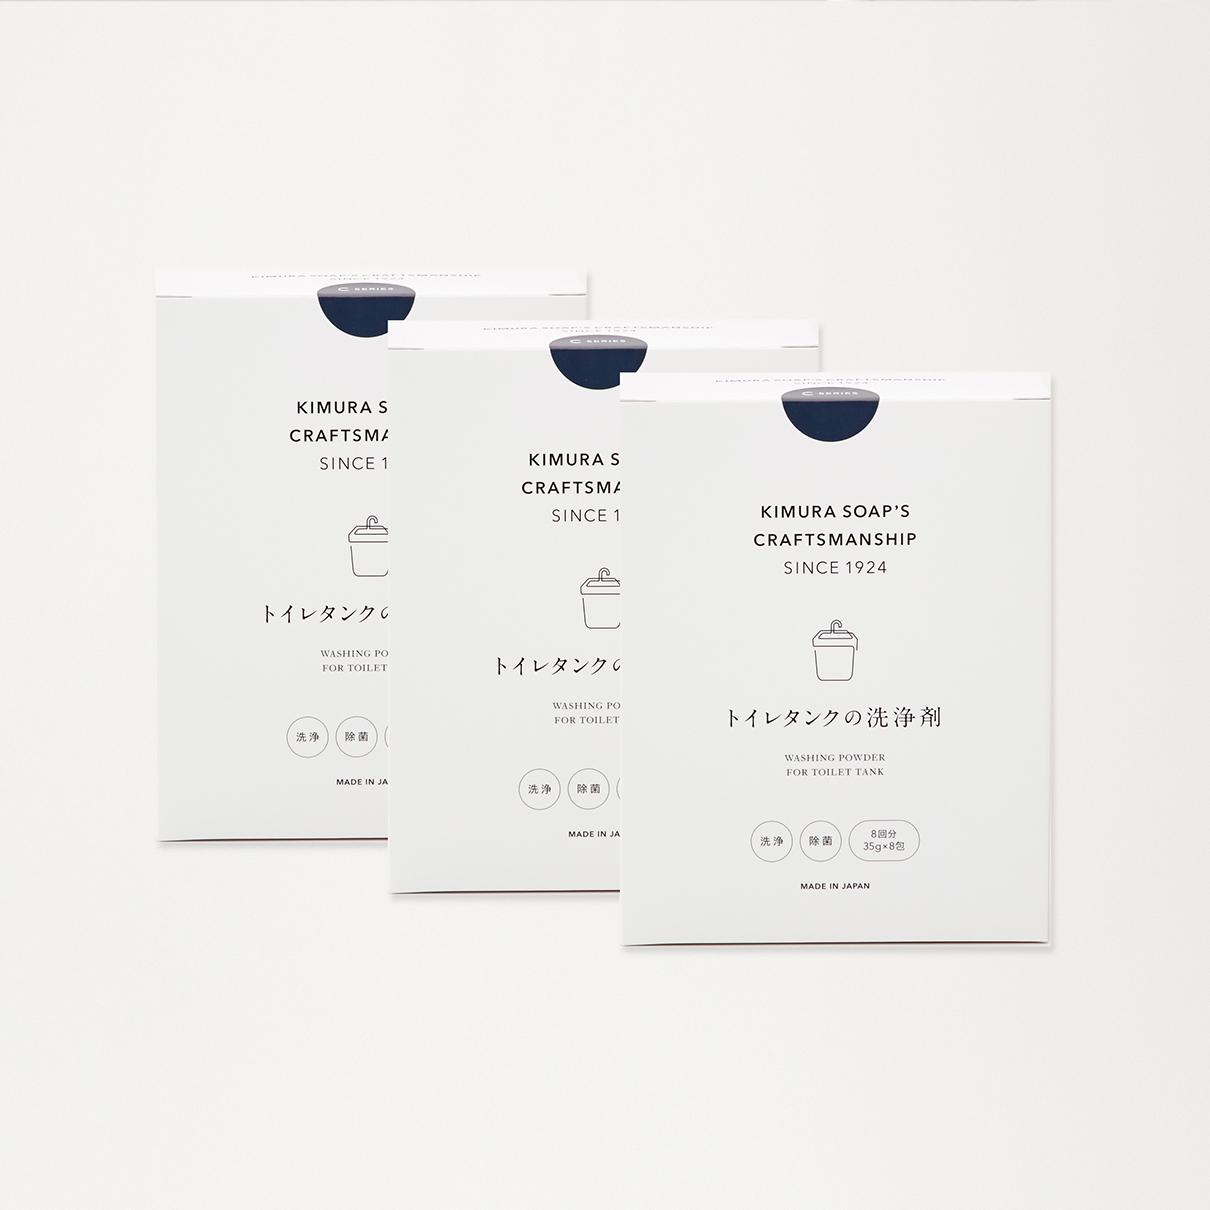 Made In Japan 入れて放置するだけでトイレタンク掃除 除菌効果も 旧トイレタンク洗浄剤トイレキレイ 酸素系 3箱セット SERIES C Cシリーズ トイレタンクの洗浄剤 合成界面活性剤不使用で安心のエコ洗剤 物品 メーカー在庫限り品